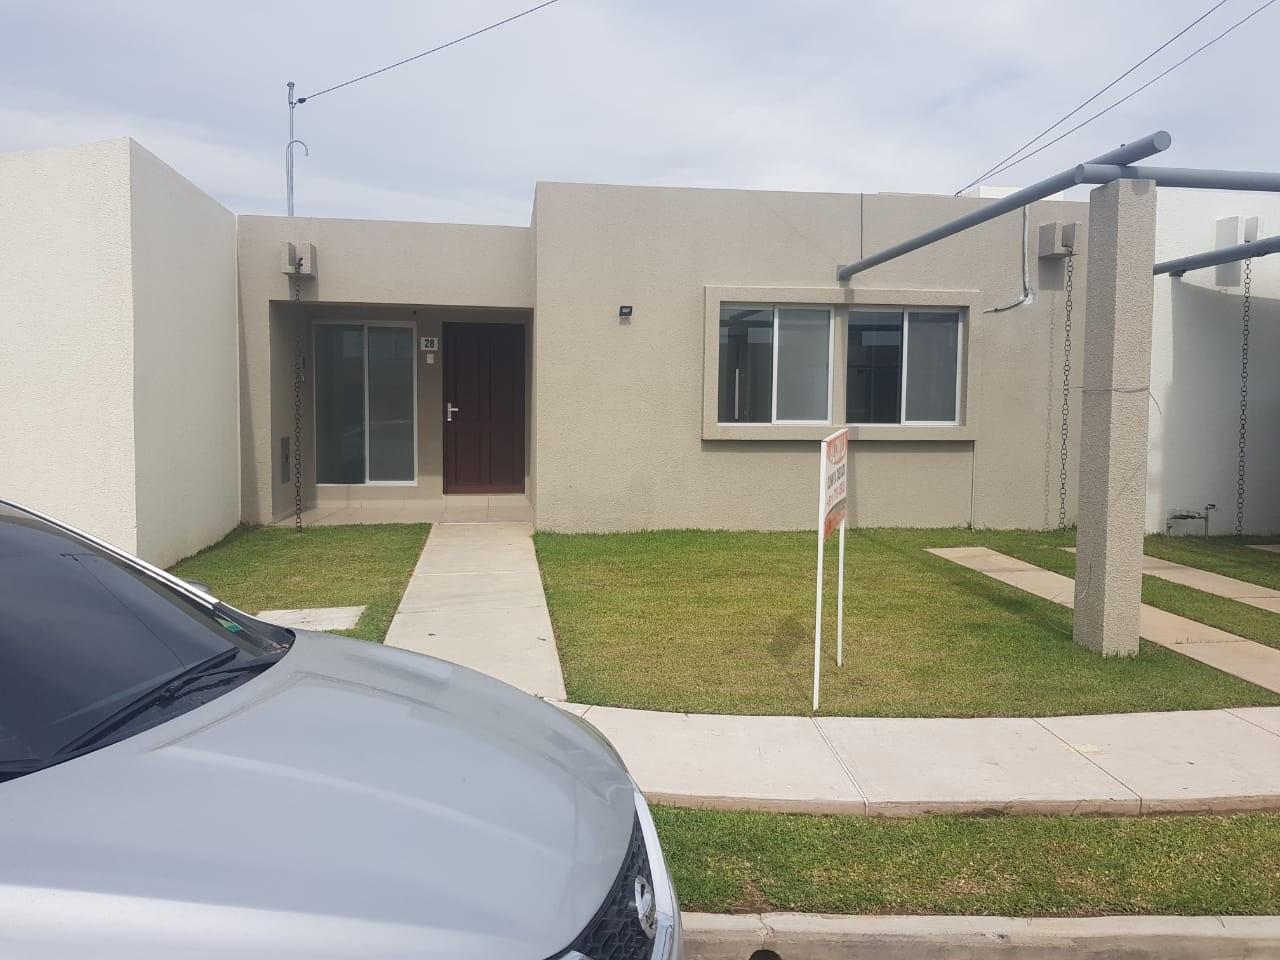 Inmobiliaria ofrece en alquiler casa en condominio for Alquiler de casas en cantillana sevilla